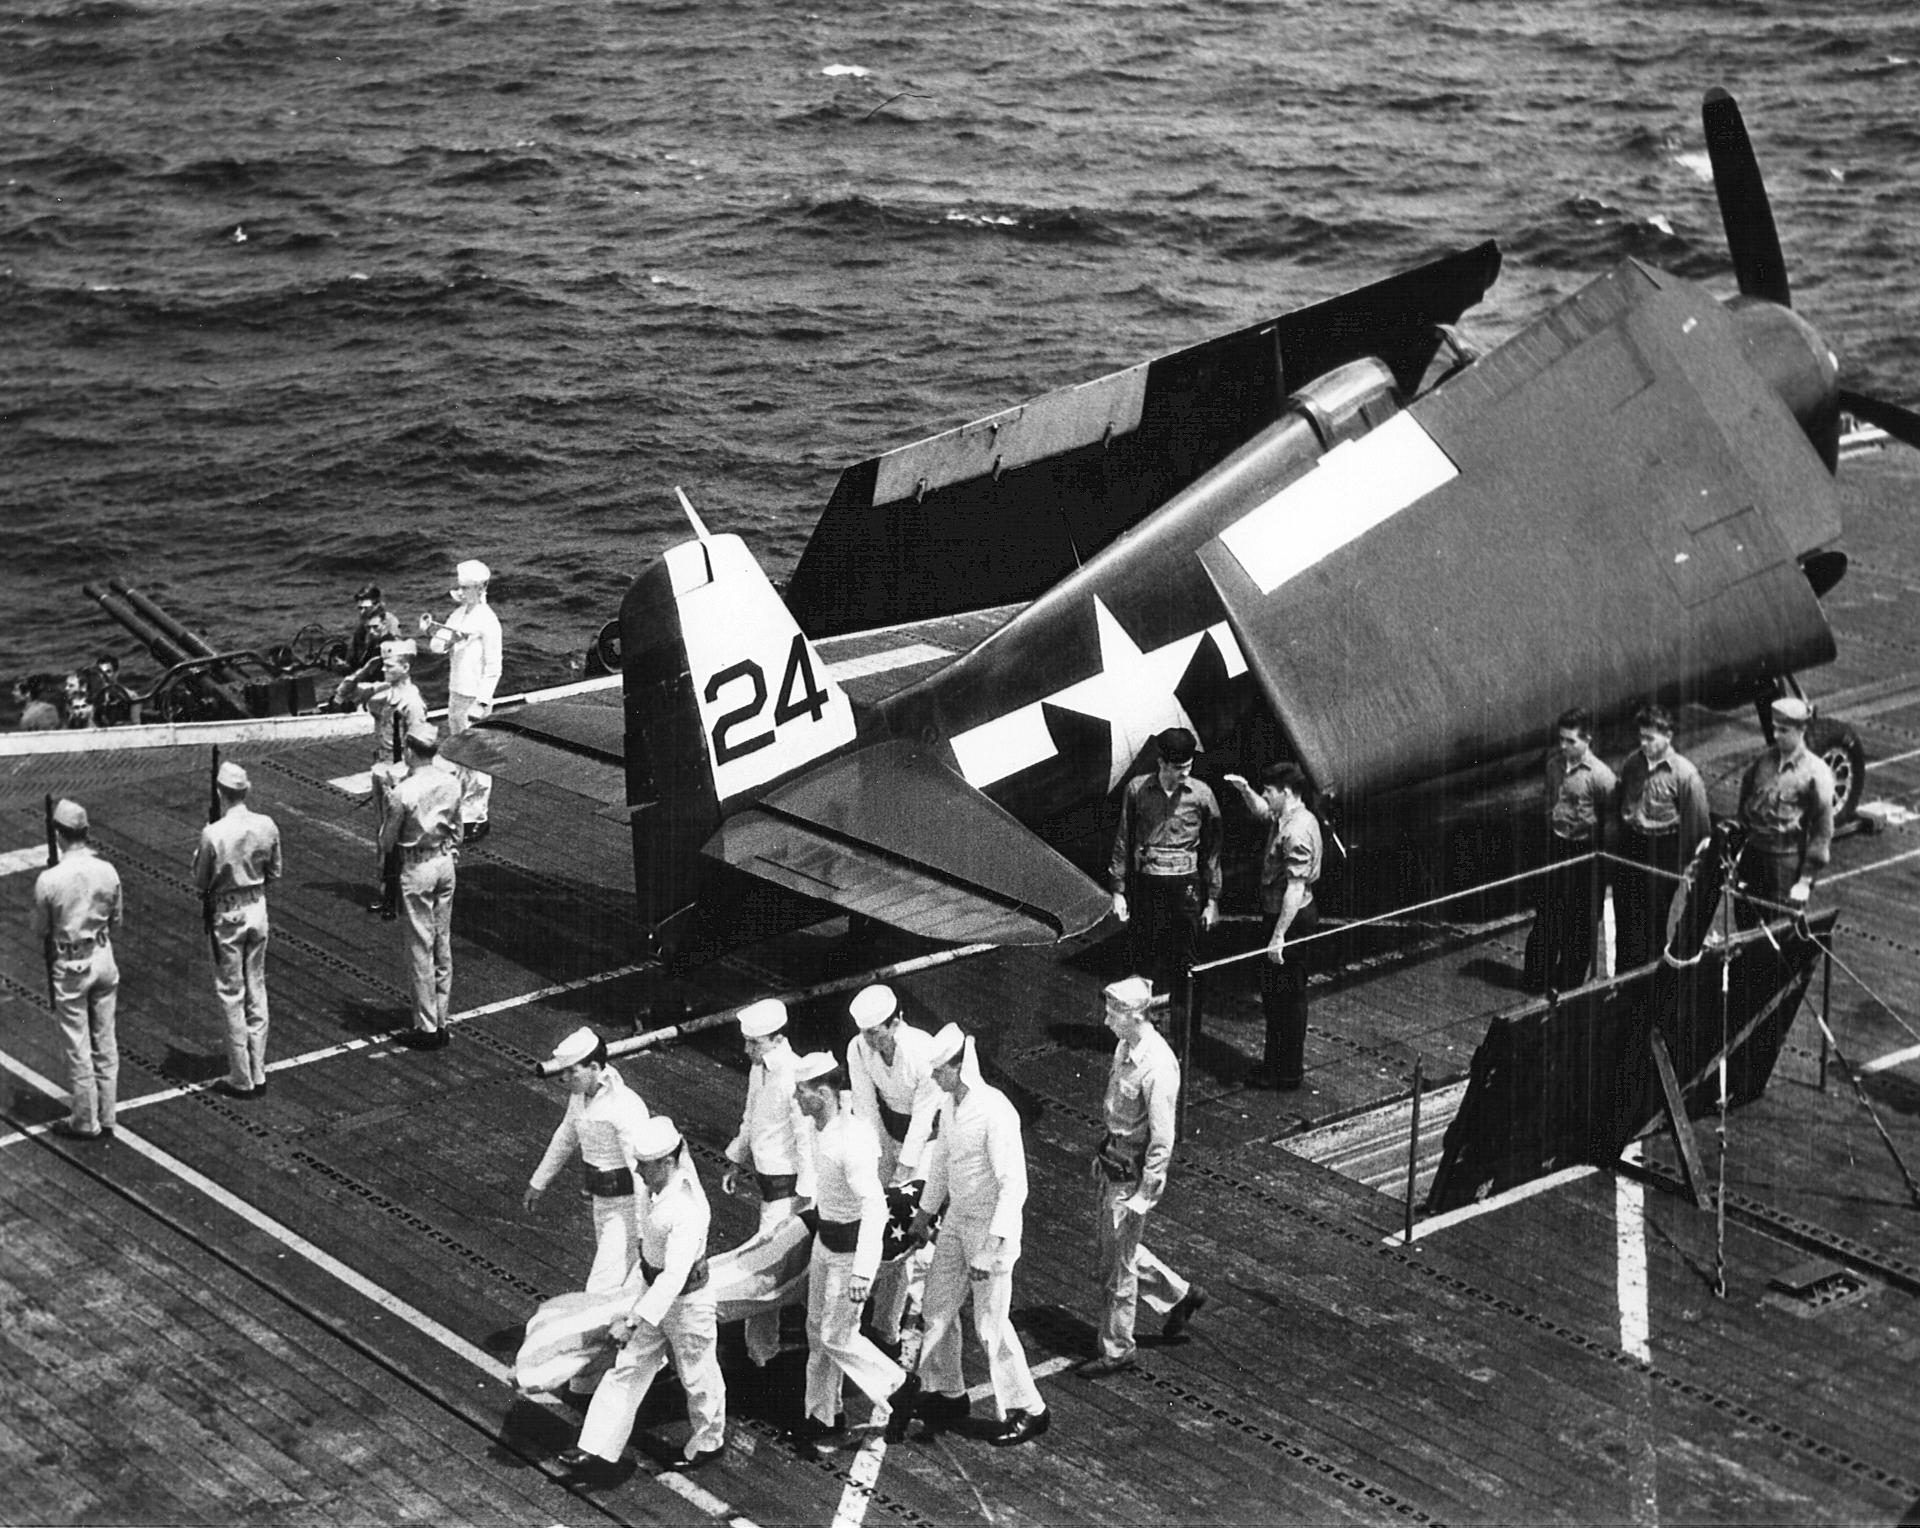 Grumman F6F 5 Hellcat VF 47 Black 24 during an honor guard CVL 29 USS Bataan 01